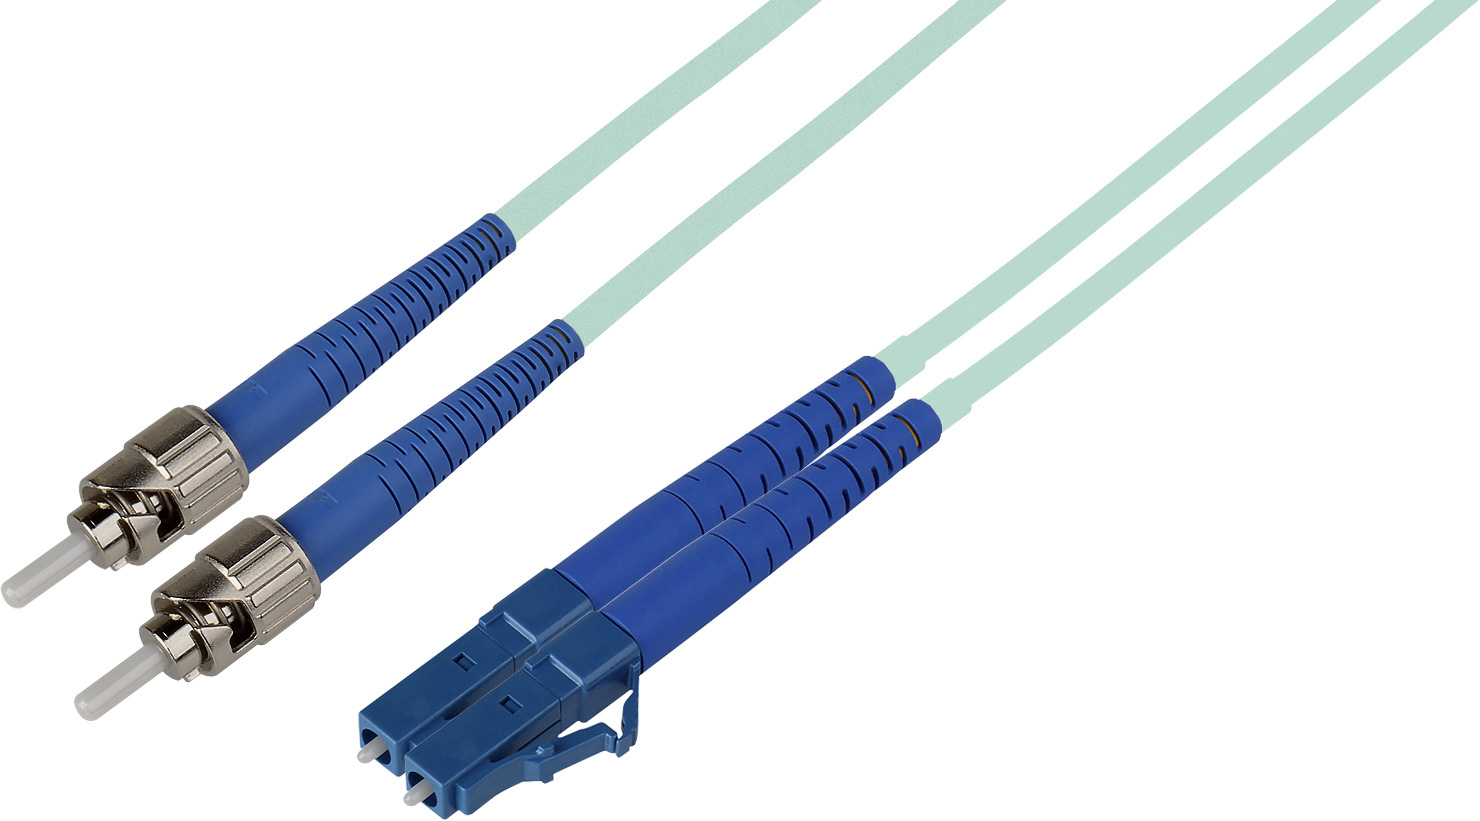 5 Meter 50 125 Fiber Optic Patch Cable Multimode Duplex St